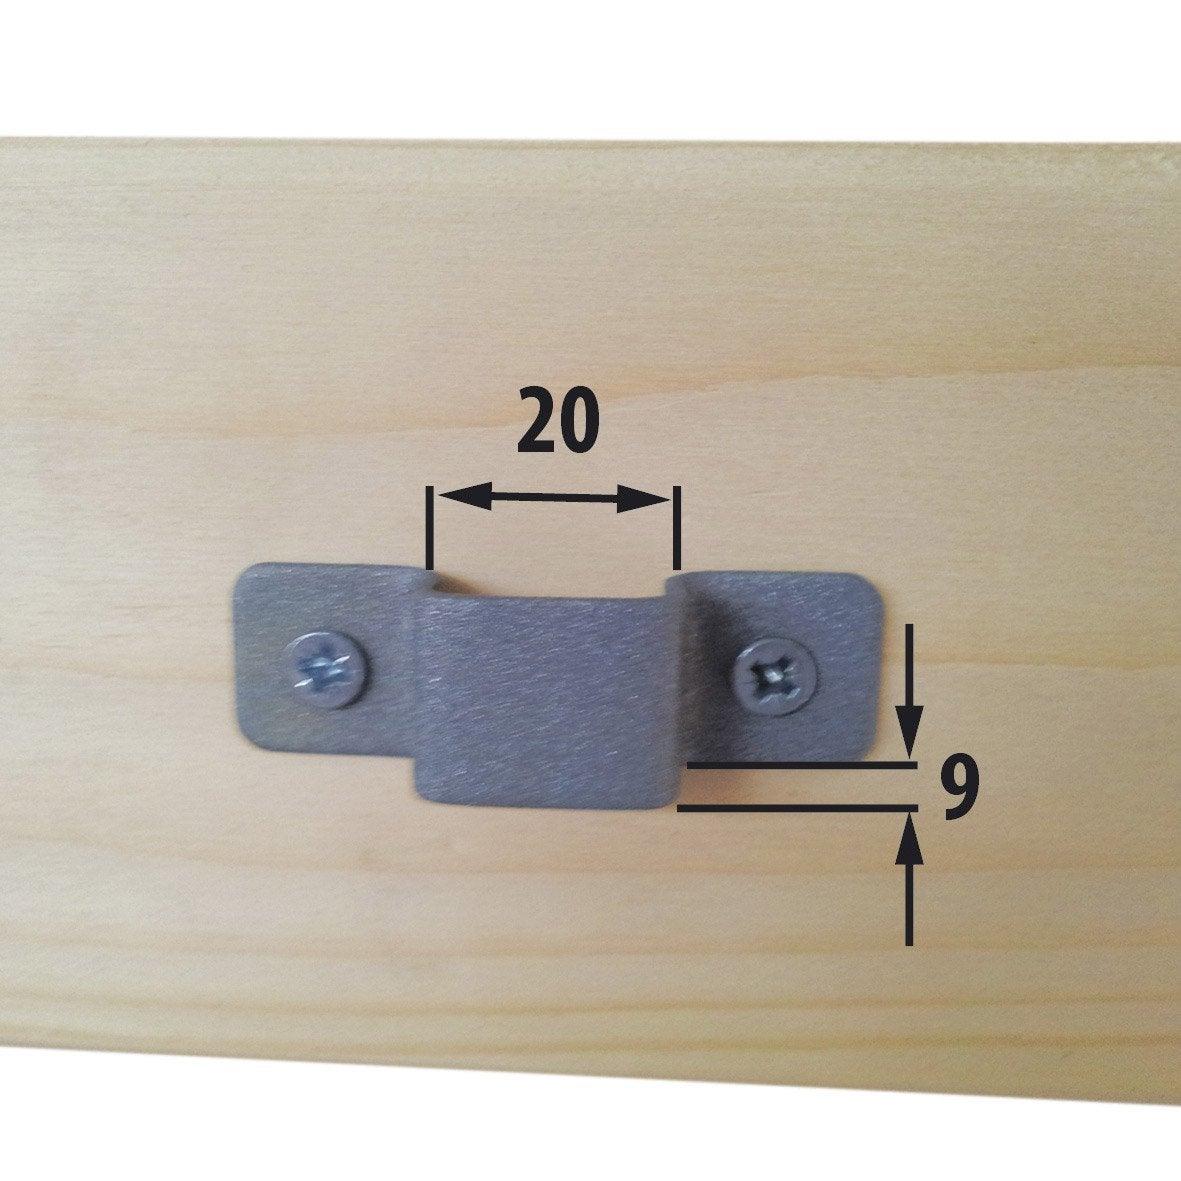 gache pour verrou 20 x 9 mm leroy merlin. Black Bedroom Furniture Sets. Home Design Ideas